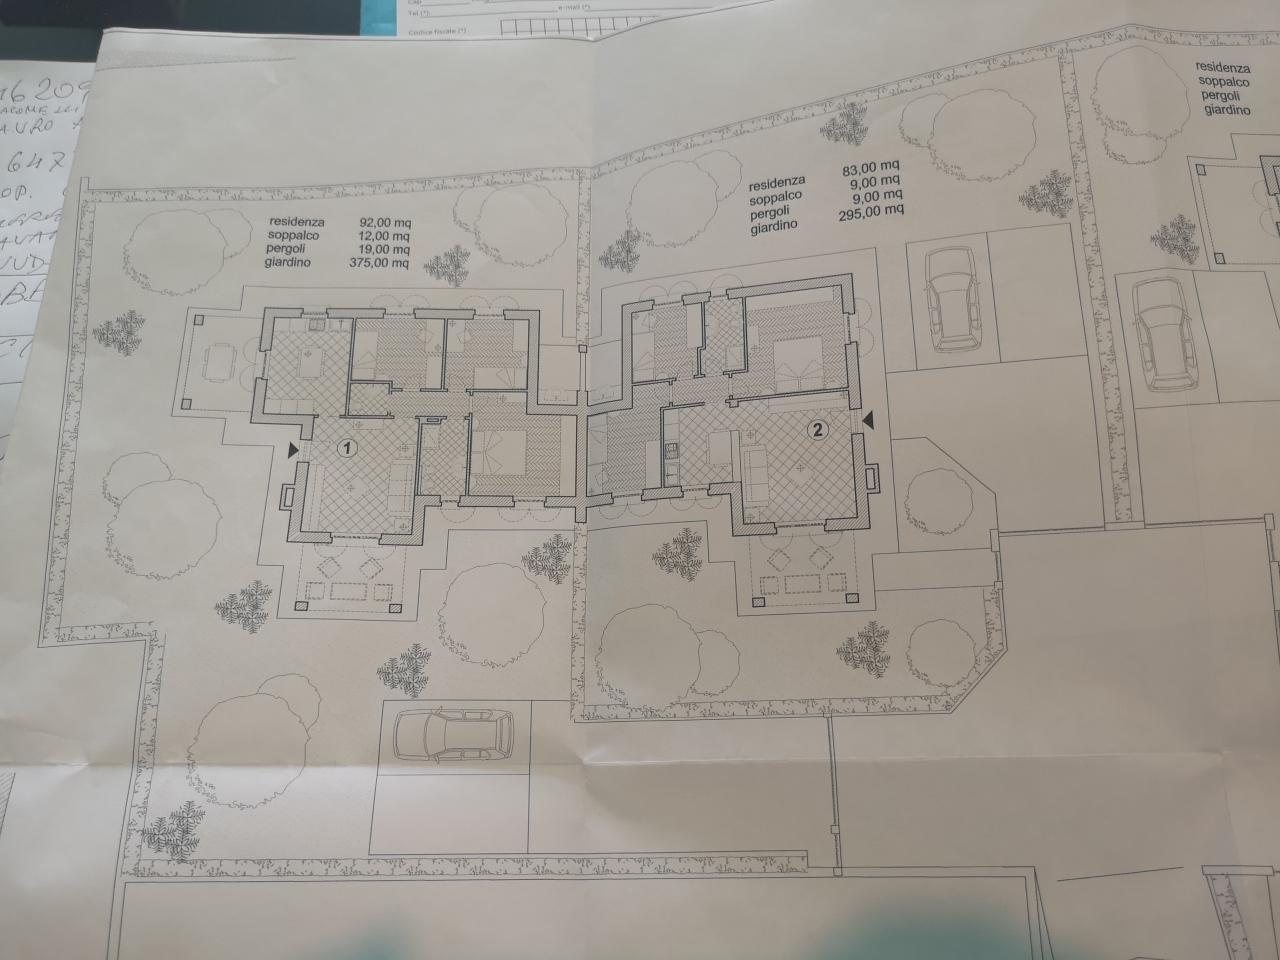 Villa singola in vendita - Castelnuovo Magra